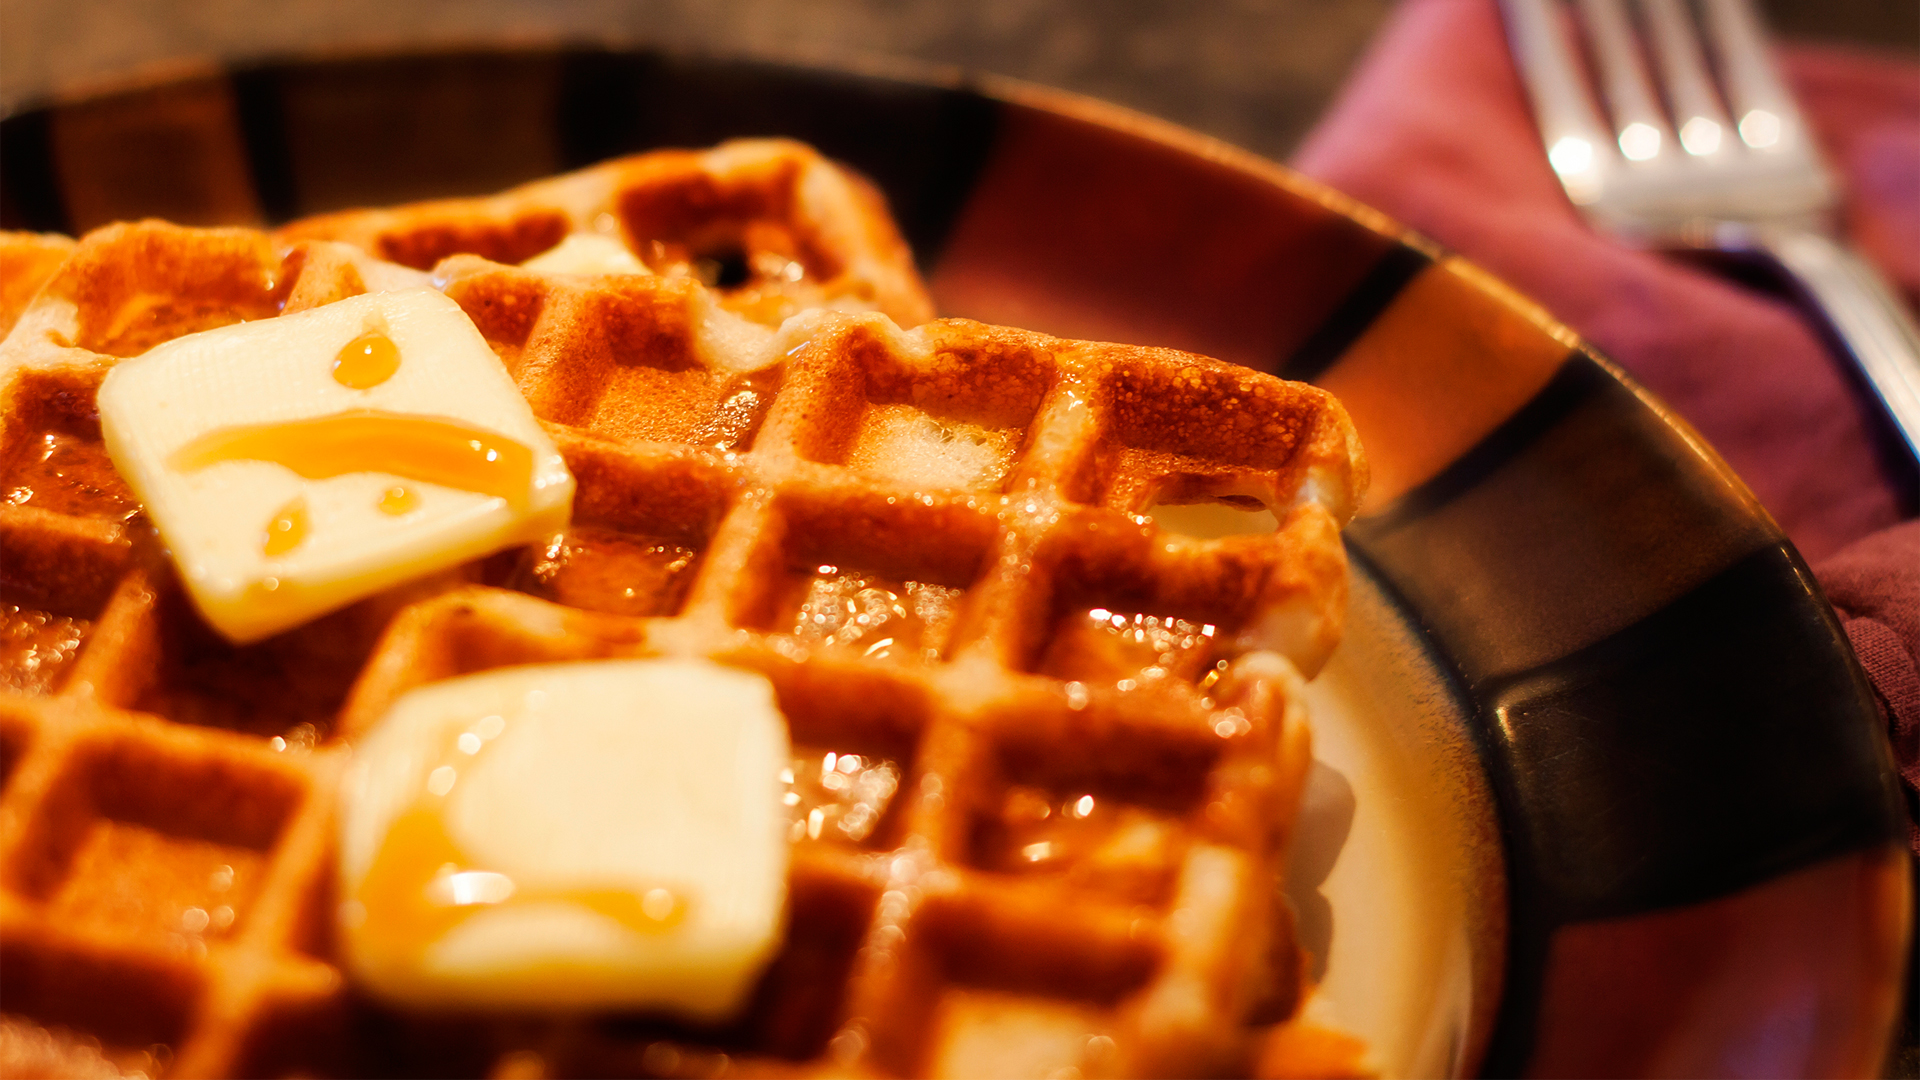 waffles wallpaper 2560x1600 - photo #20